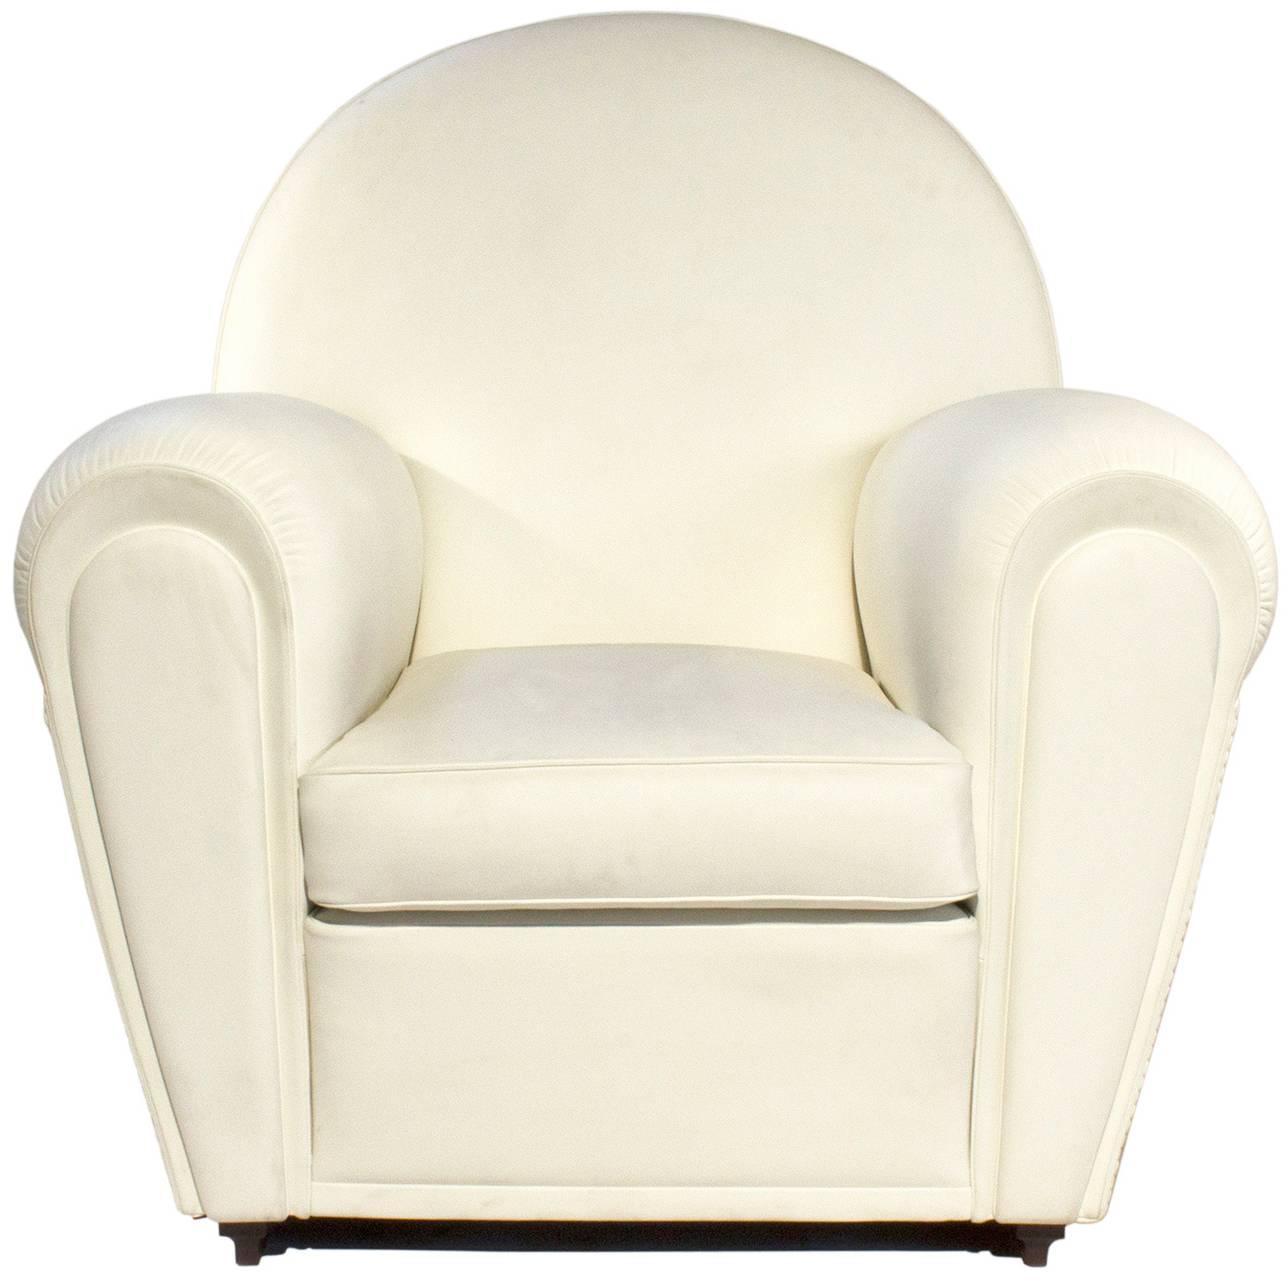 White Leather Vanity Fair Armchair by Renzo Frau for Poltrona Frau ...